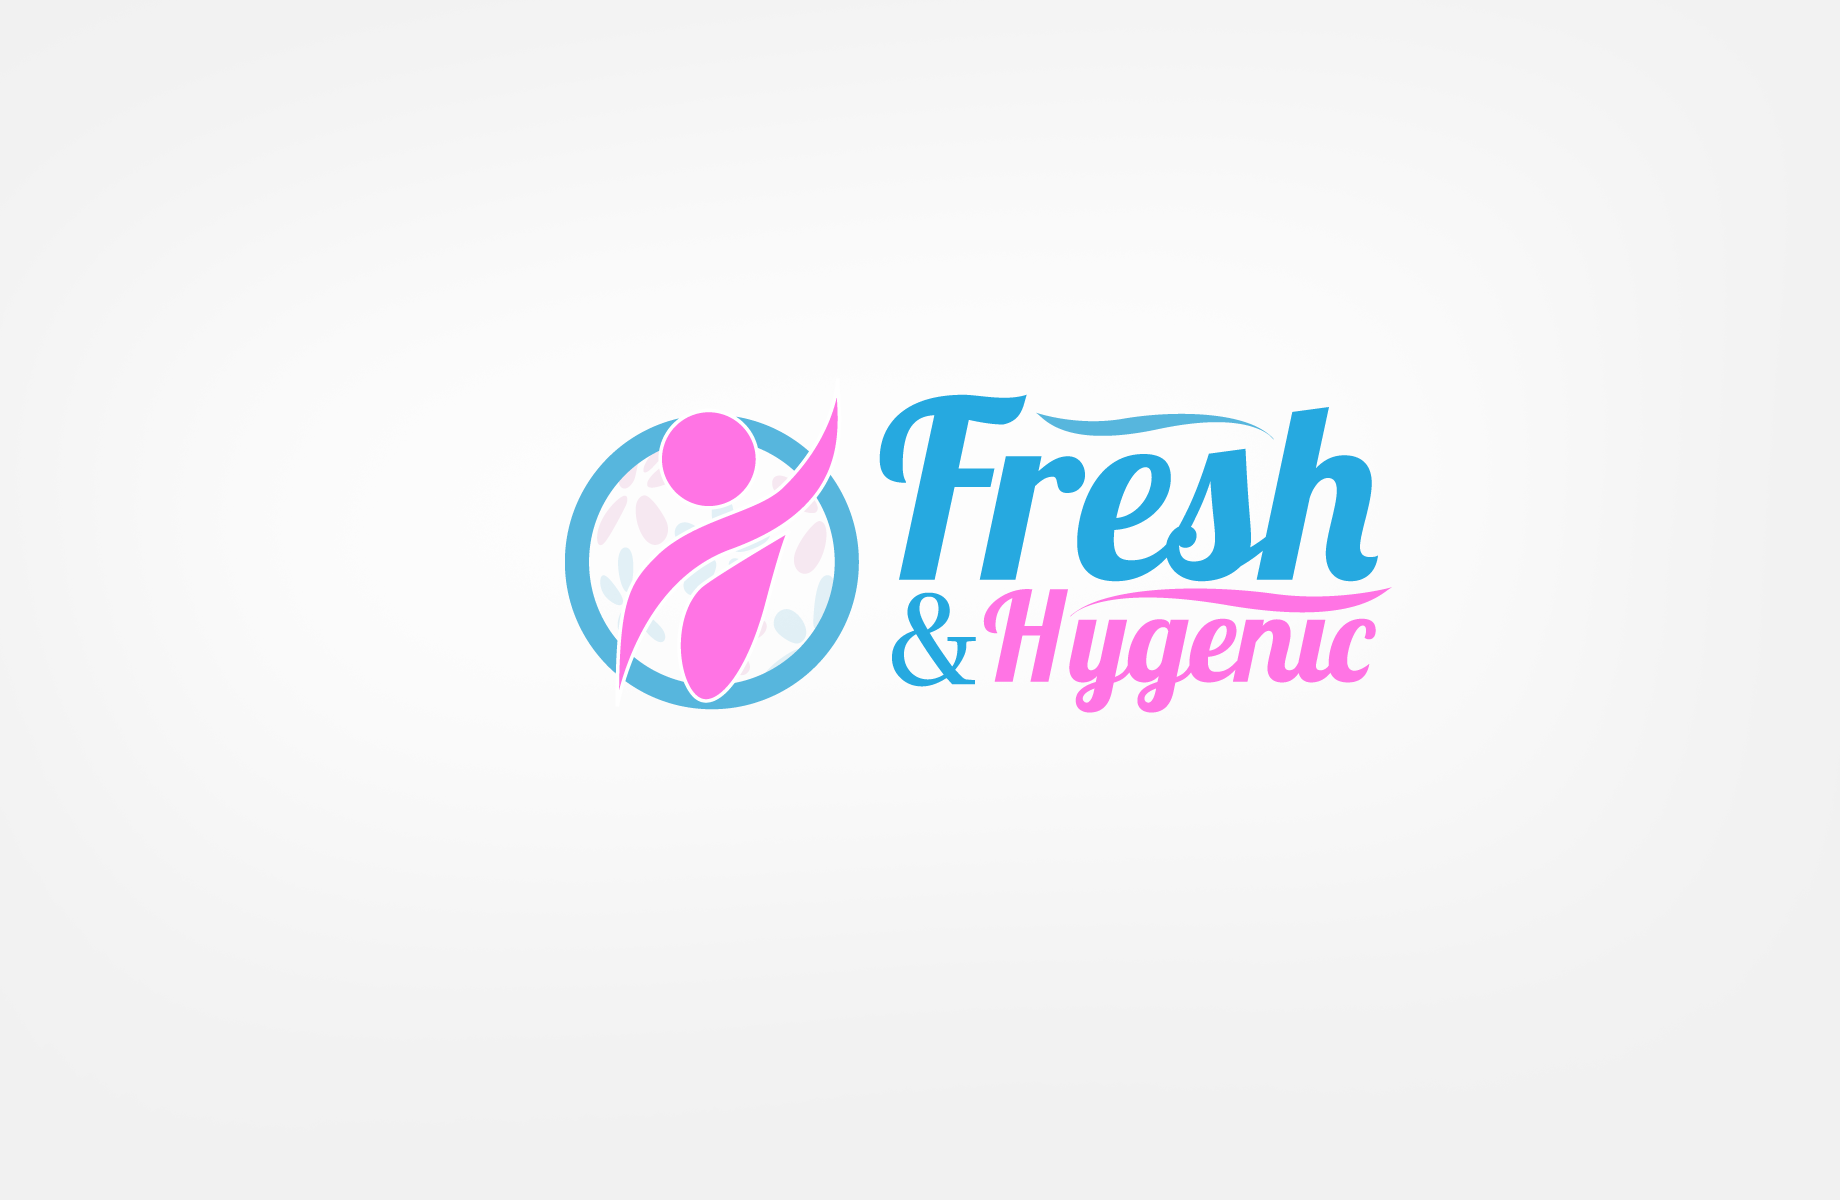 Logo Design by Jan Chua - Entry No. 54 in the Logo Design Contest Fun Logo Design for Fresh & Hygenic.